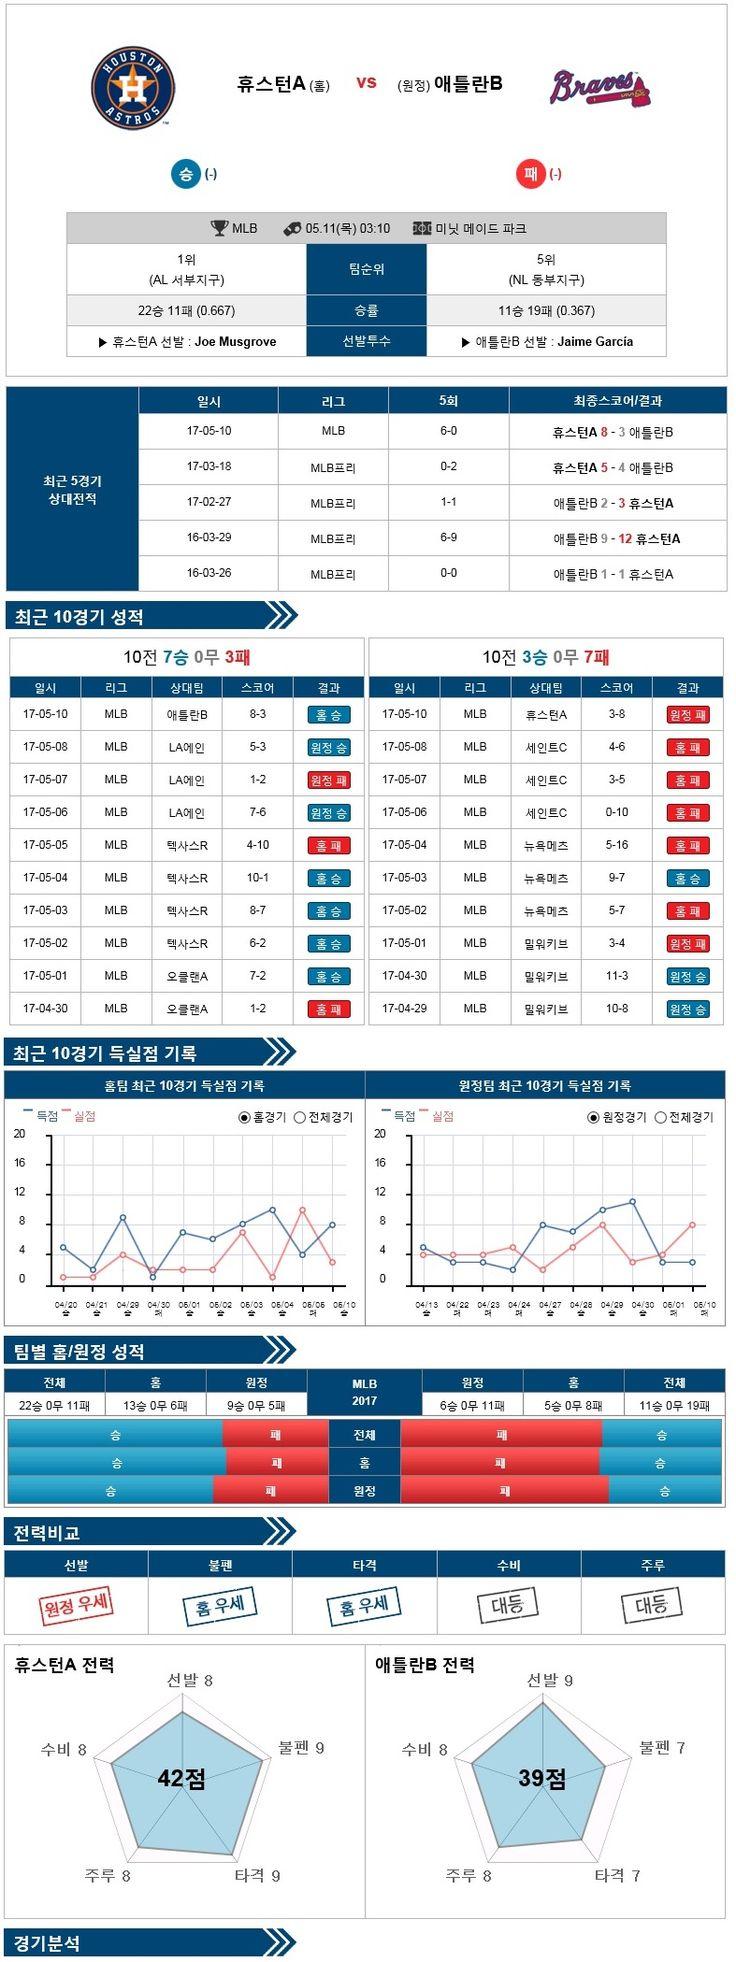 [MLB] 5월 11일 휴스턴 vs 애틀랜타 ★토토군 분석★